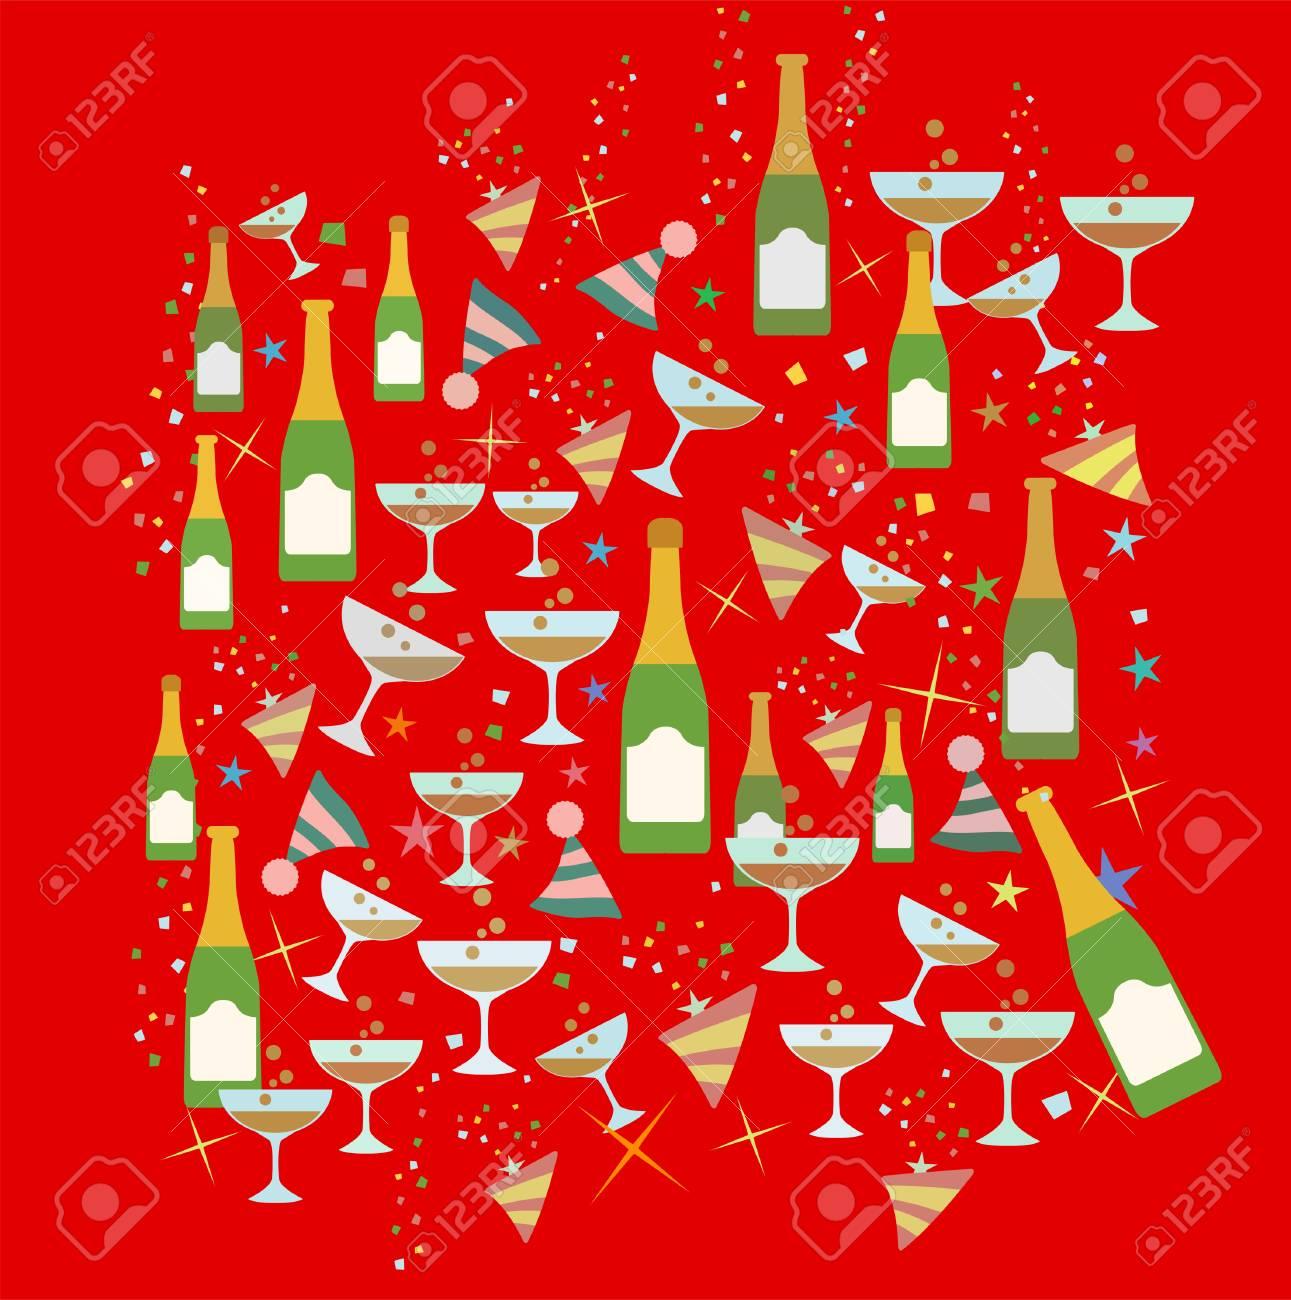 celebration toast christmas and new year party theme pattern theme illustration stock illustration 99006470